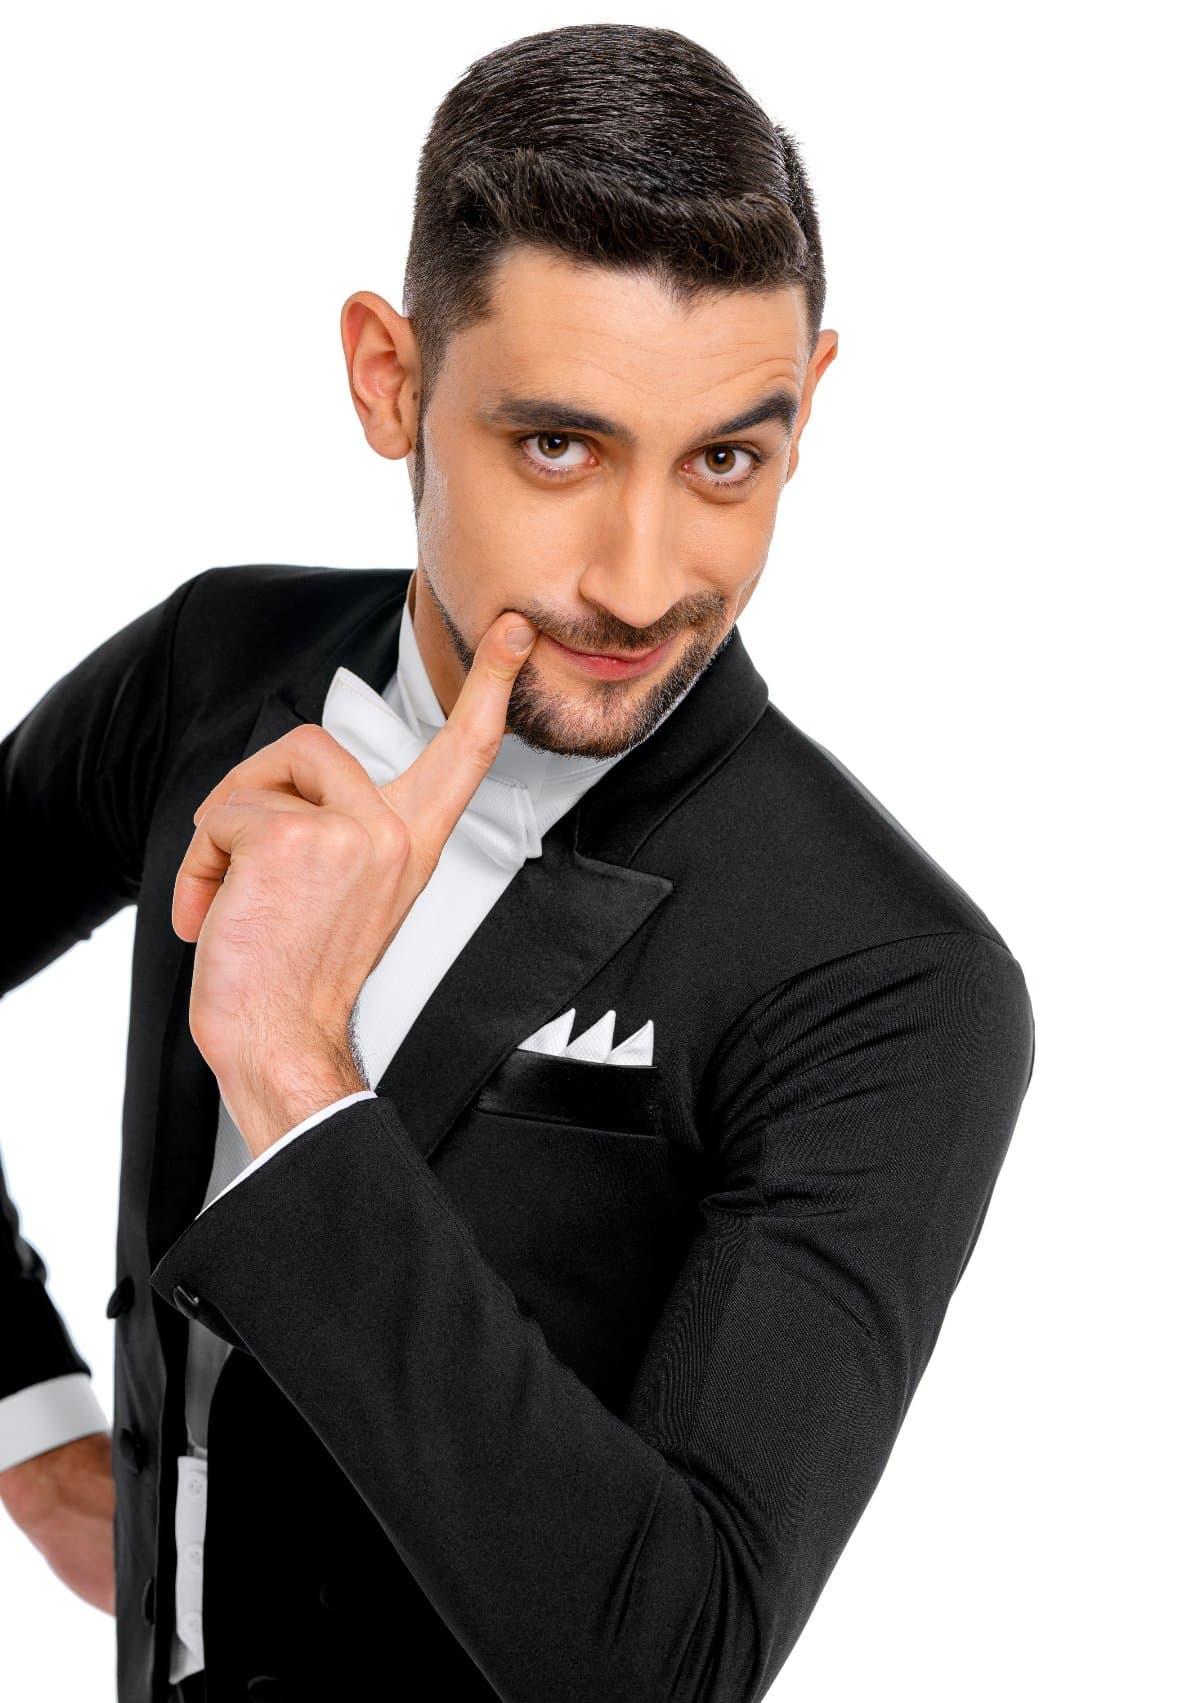 Dimitar Stefanin als Profitänzer bei den Dancing Stars 2019